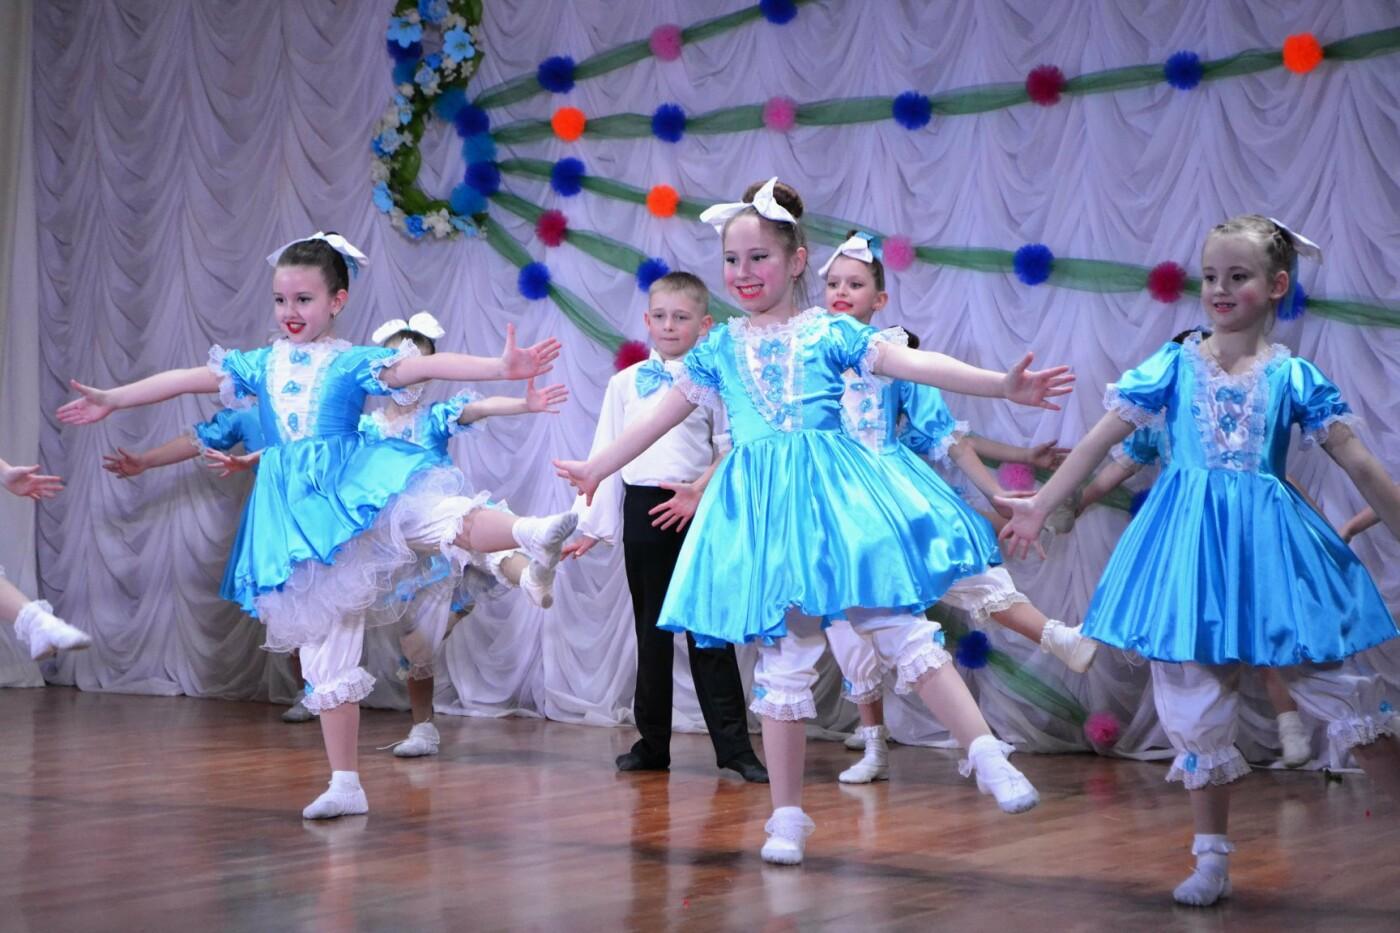 В селе Малодолинское поздравили женщин с 8 Марта, фото-6